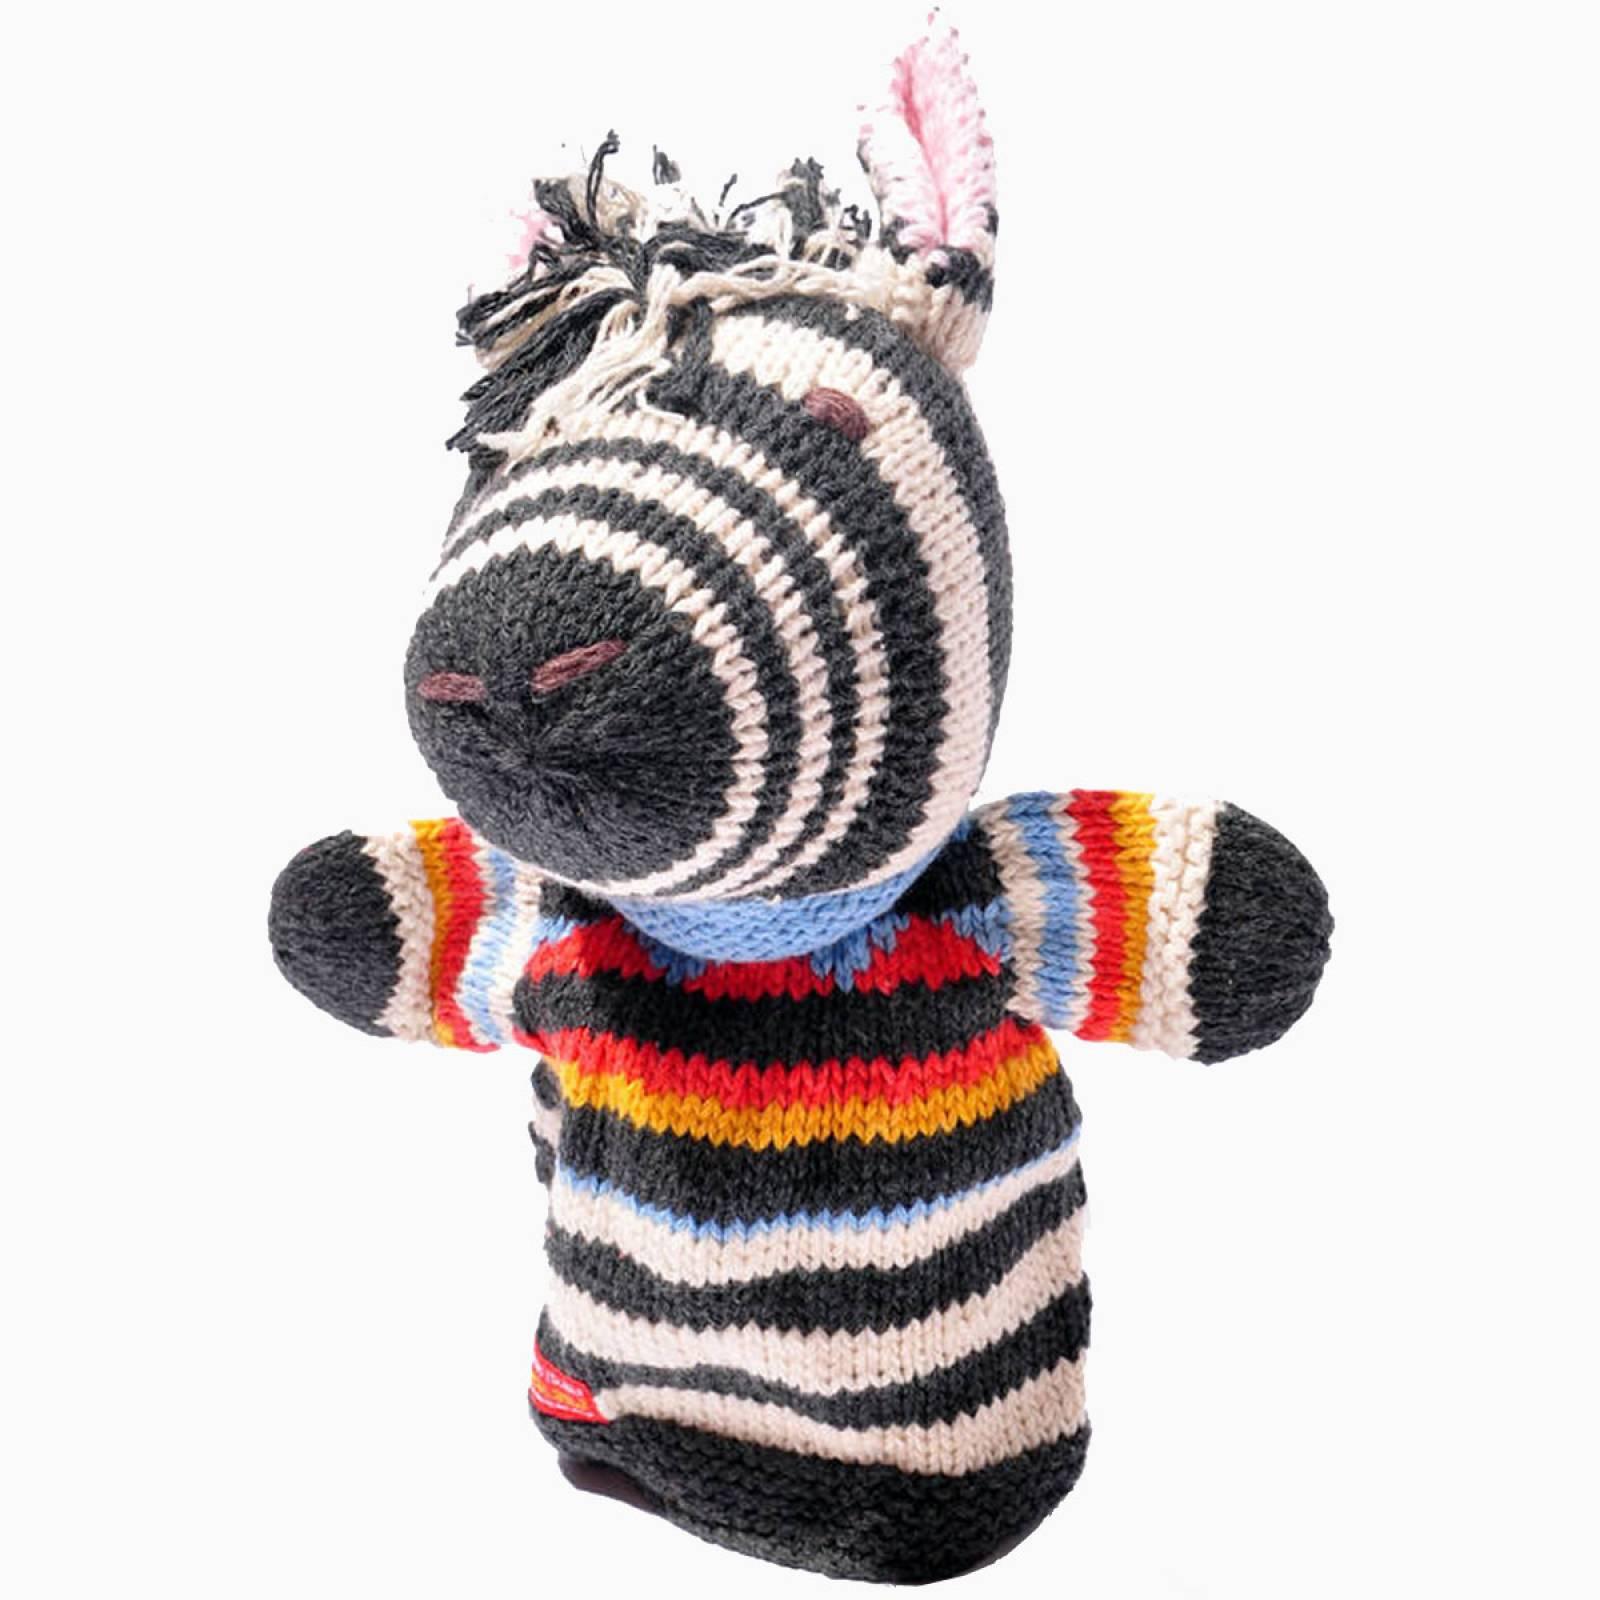 Zebra - Hand Knitted Glove Puppet Organic Cotton